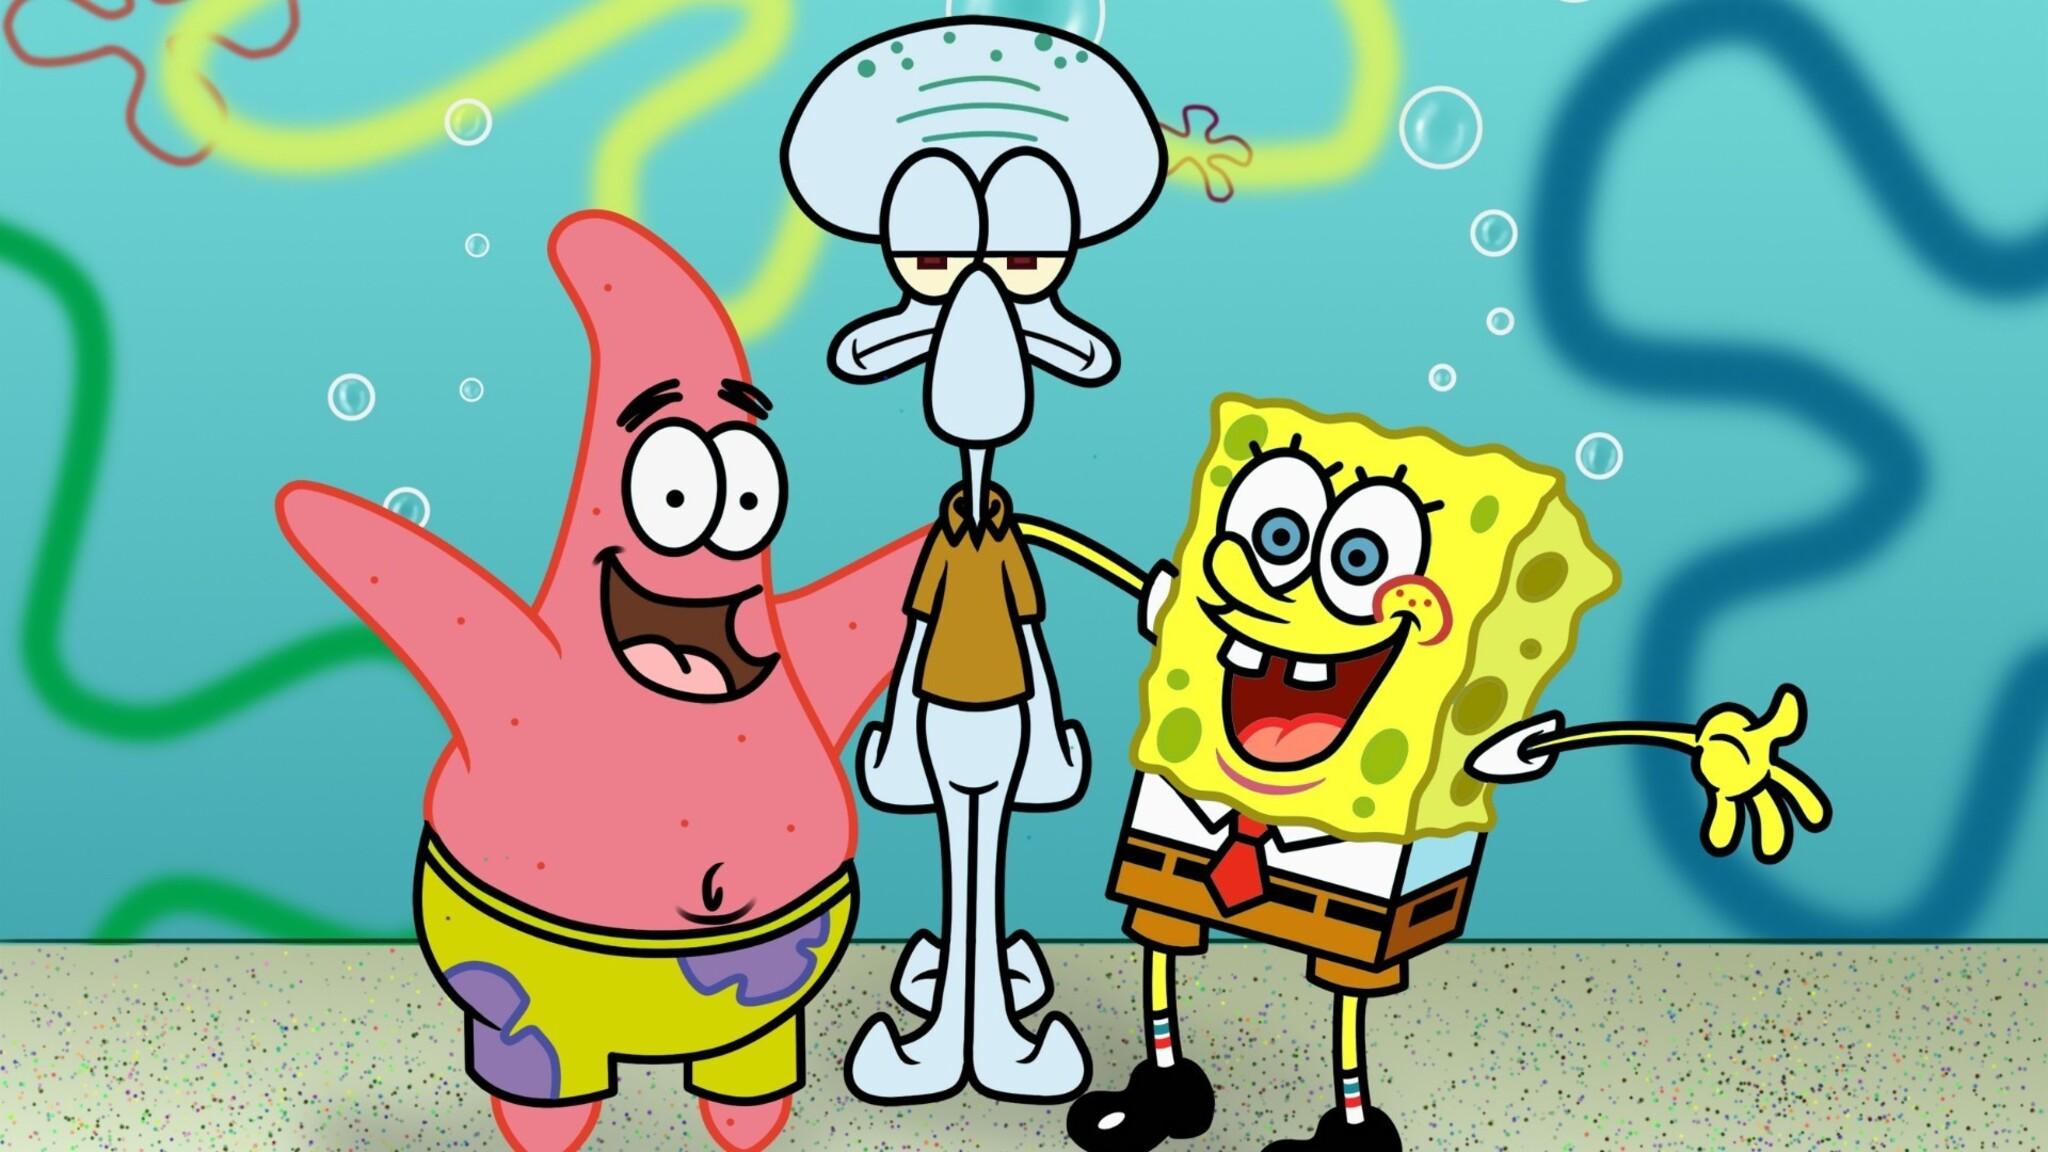 2048x1152 Spongebob Squarepants 2048x1152 Resolution Hd 4k